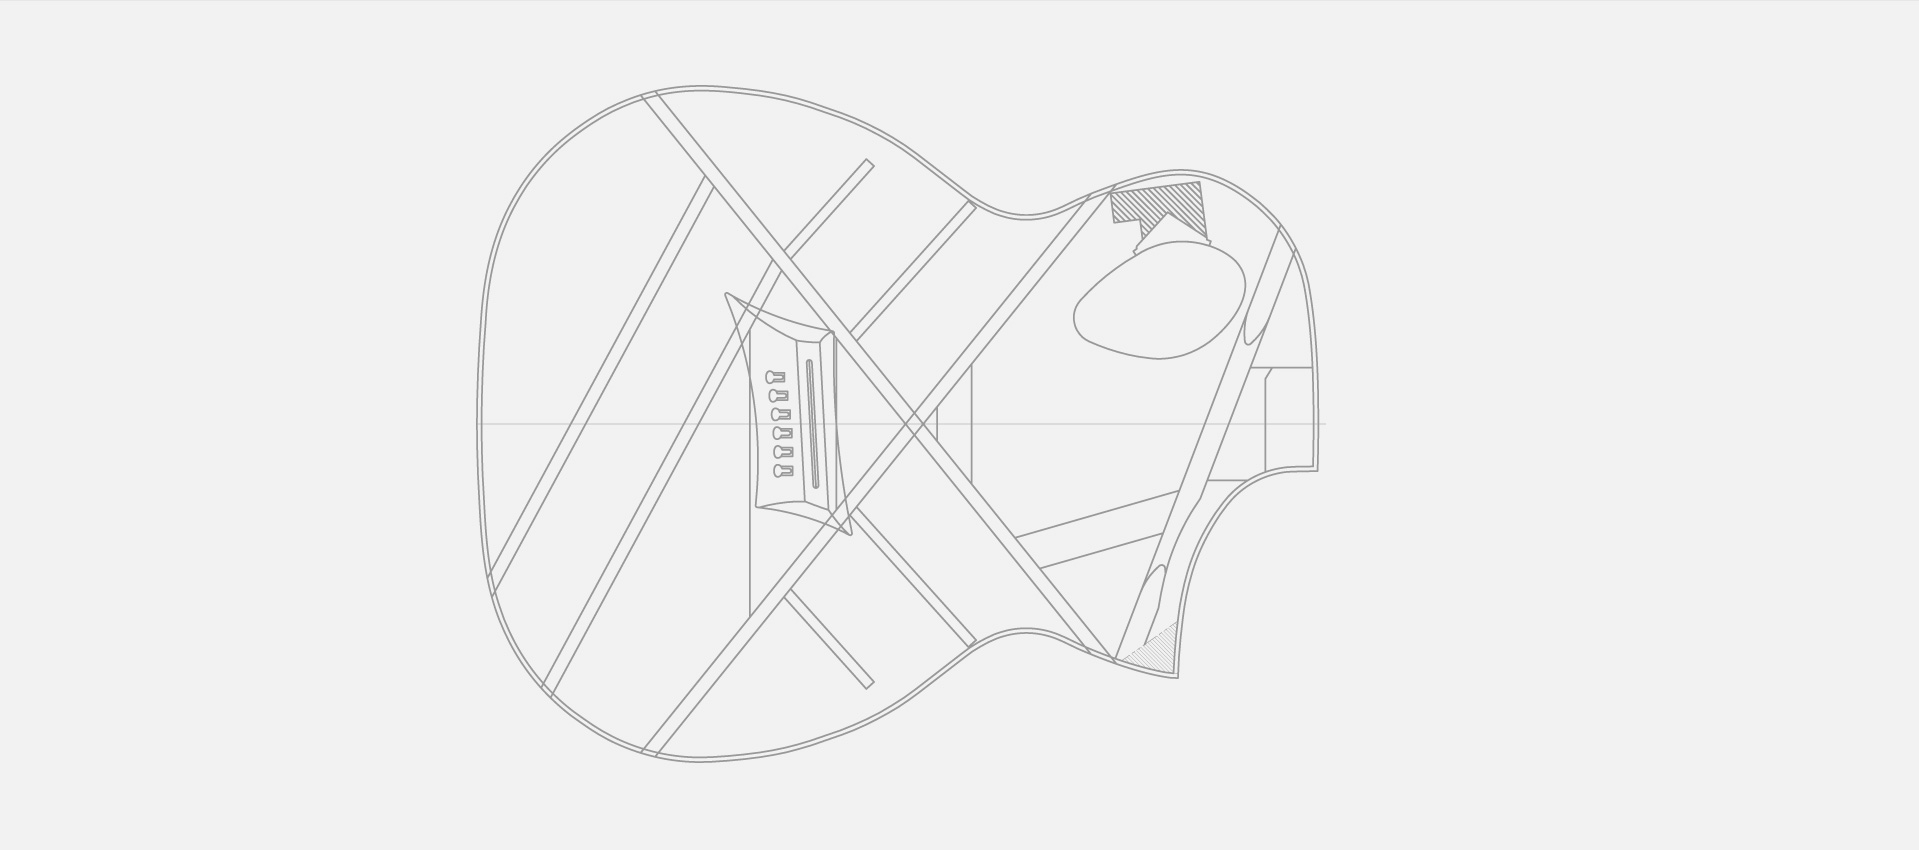 hight resolution of creates potent soundboard between neck and bridge innovative offset soundhole design port technology special bracing pattern